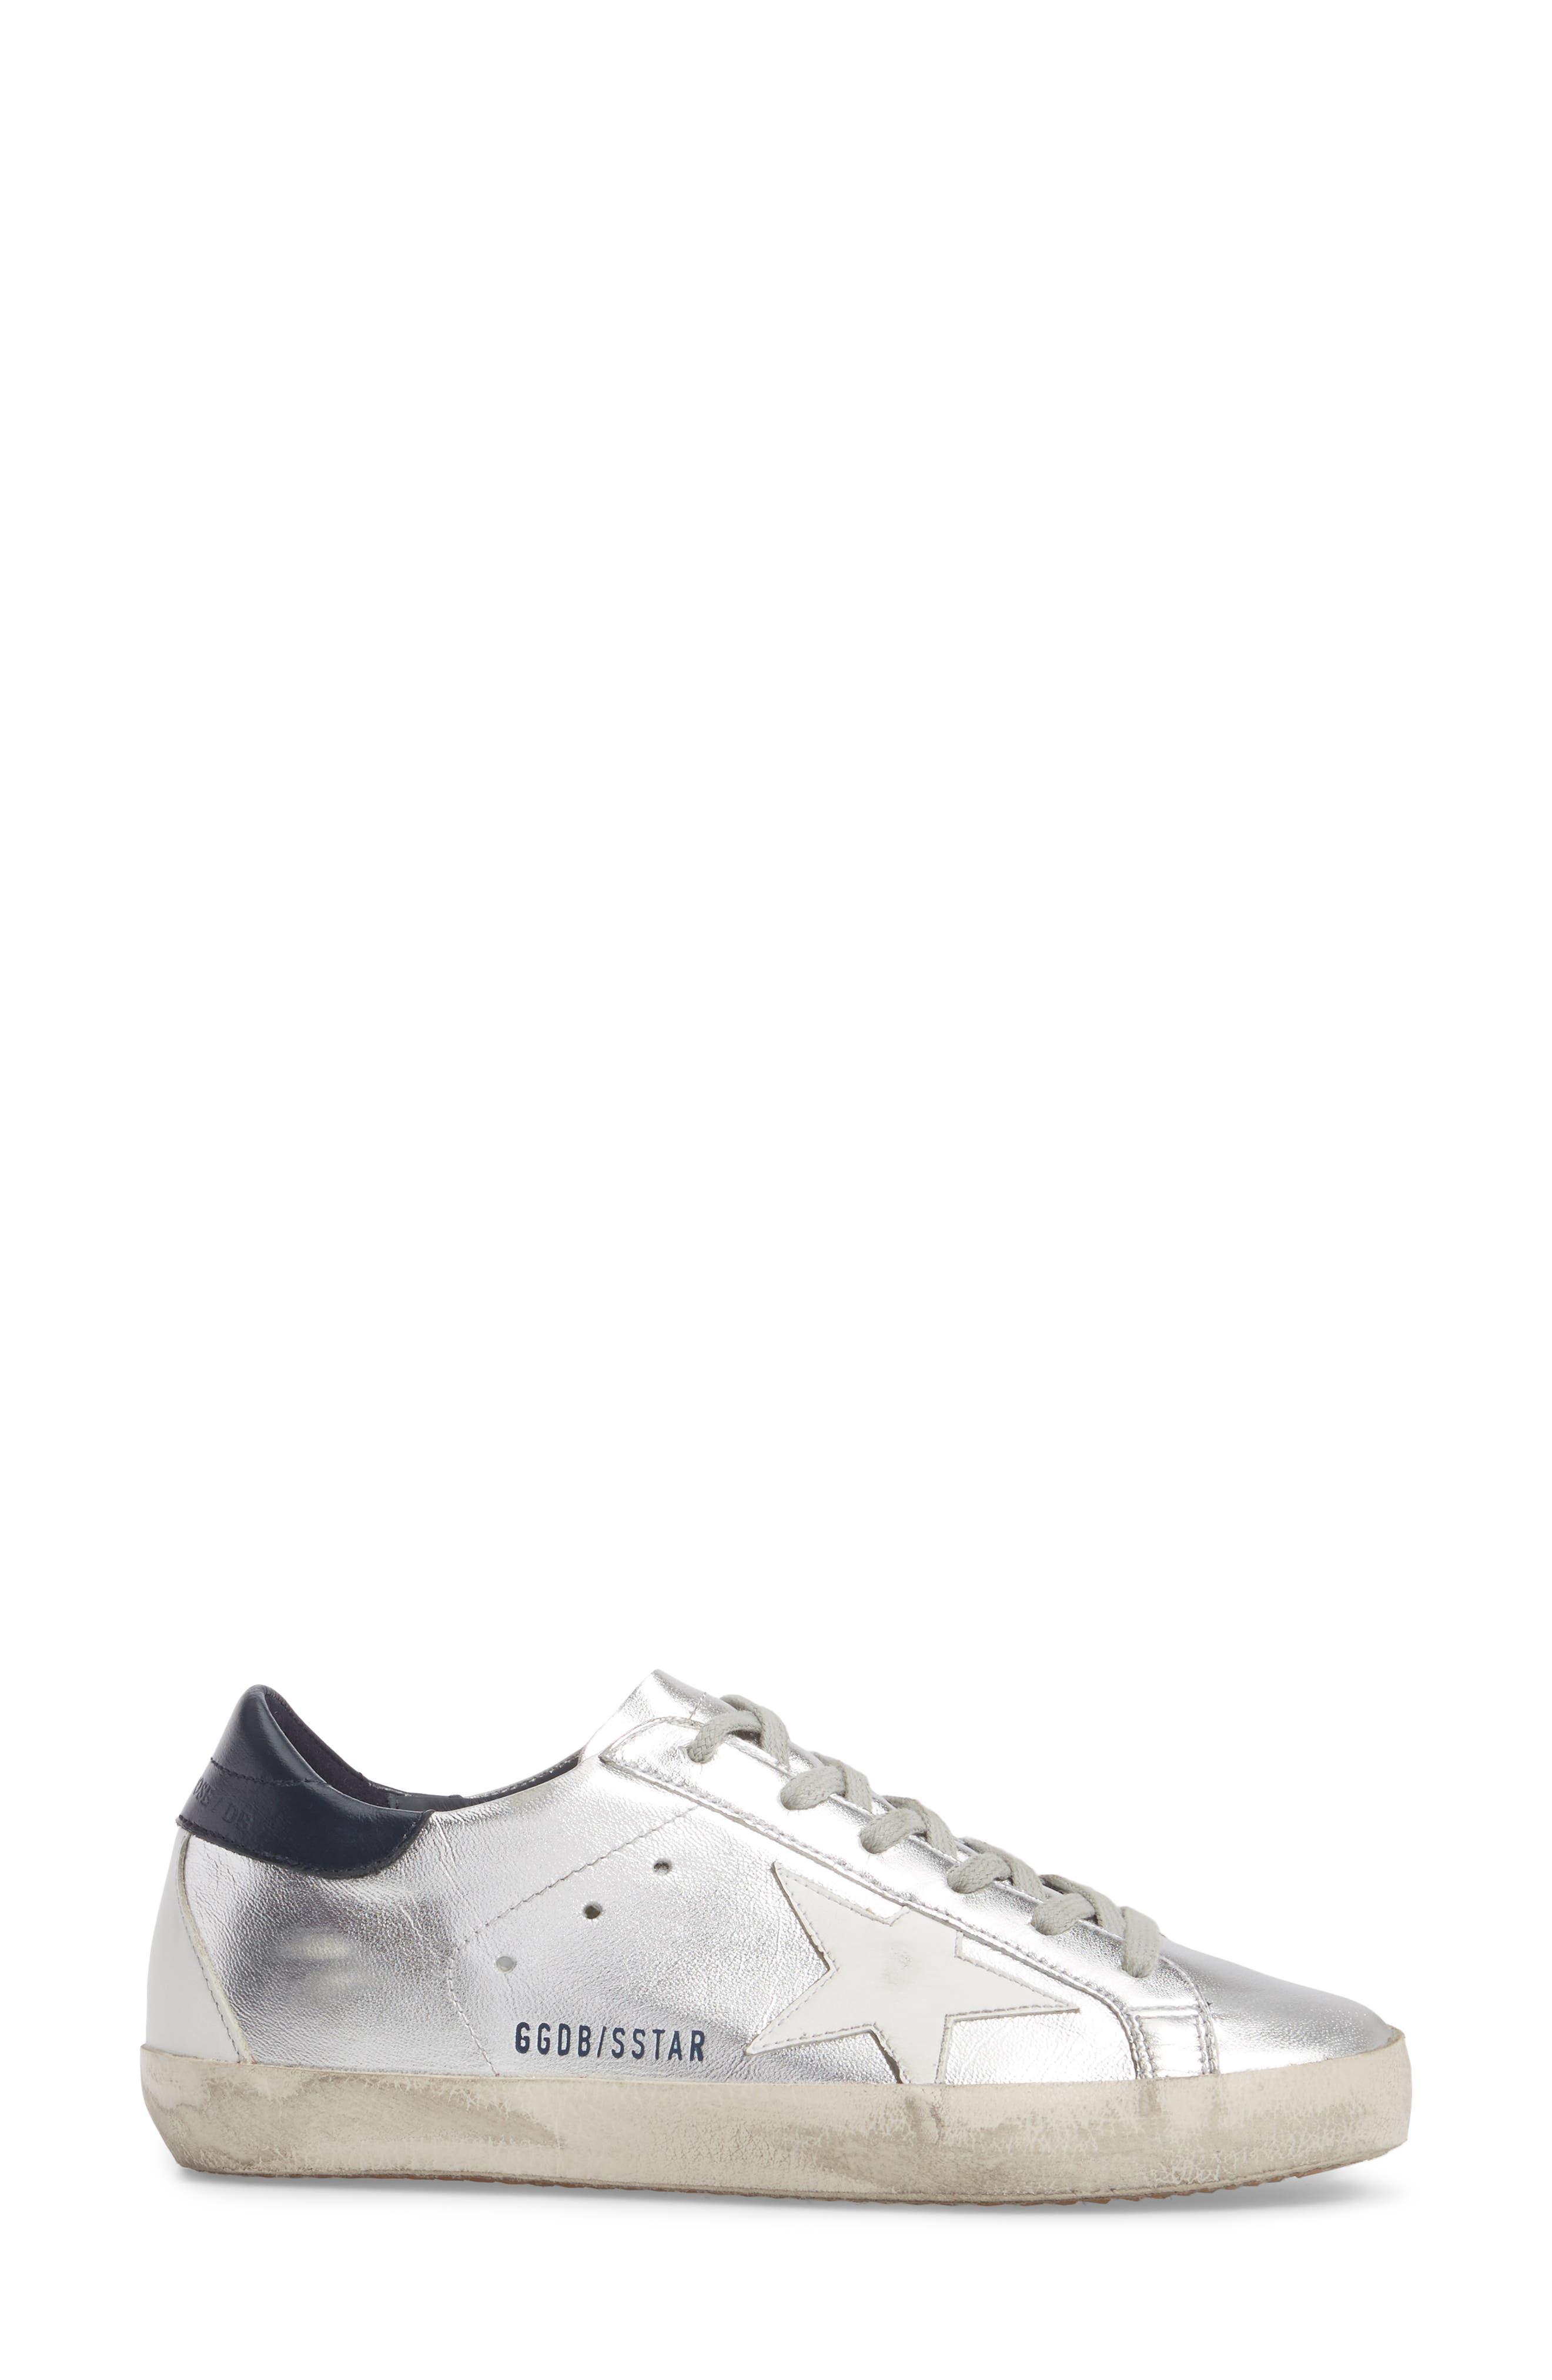 Superstar Metallic Low Top Sneaker,                             Alternate thumbnail 3, color,                             Silver